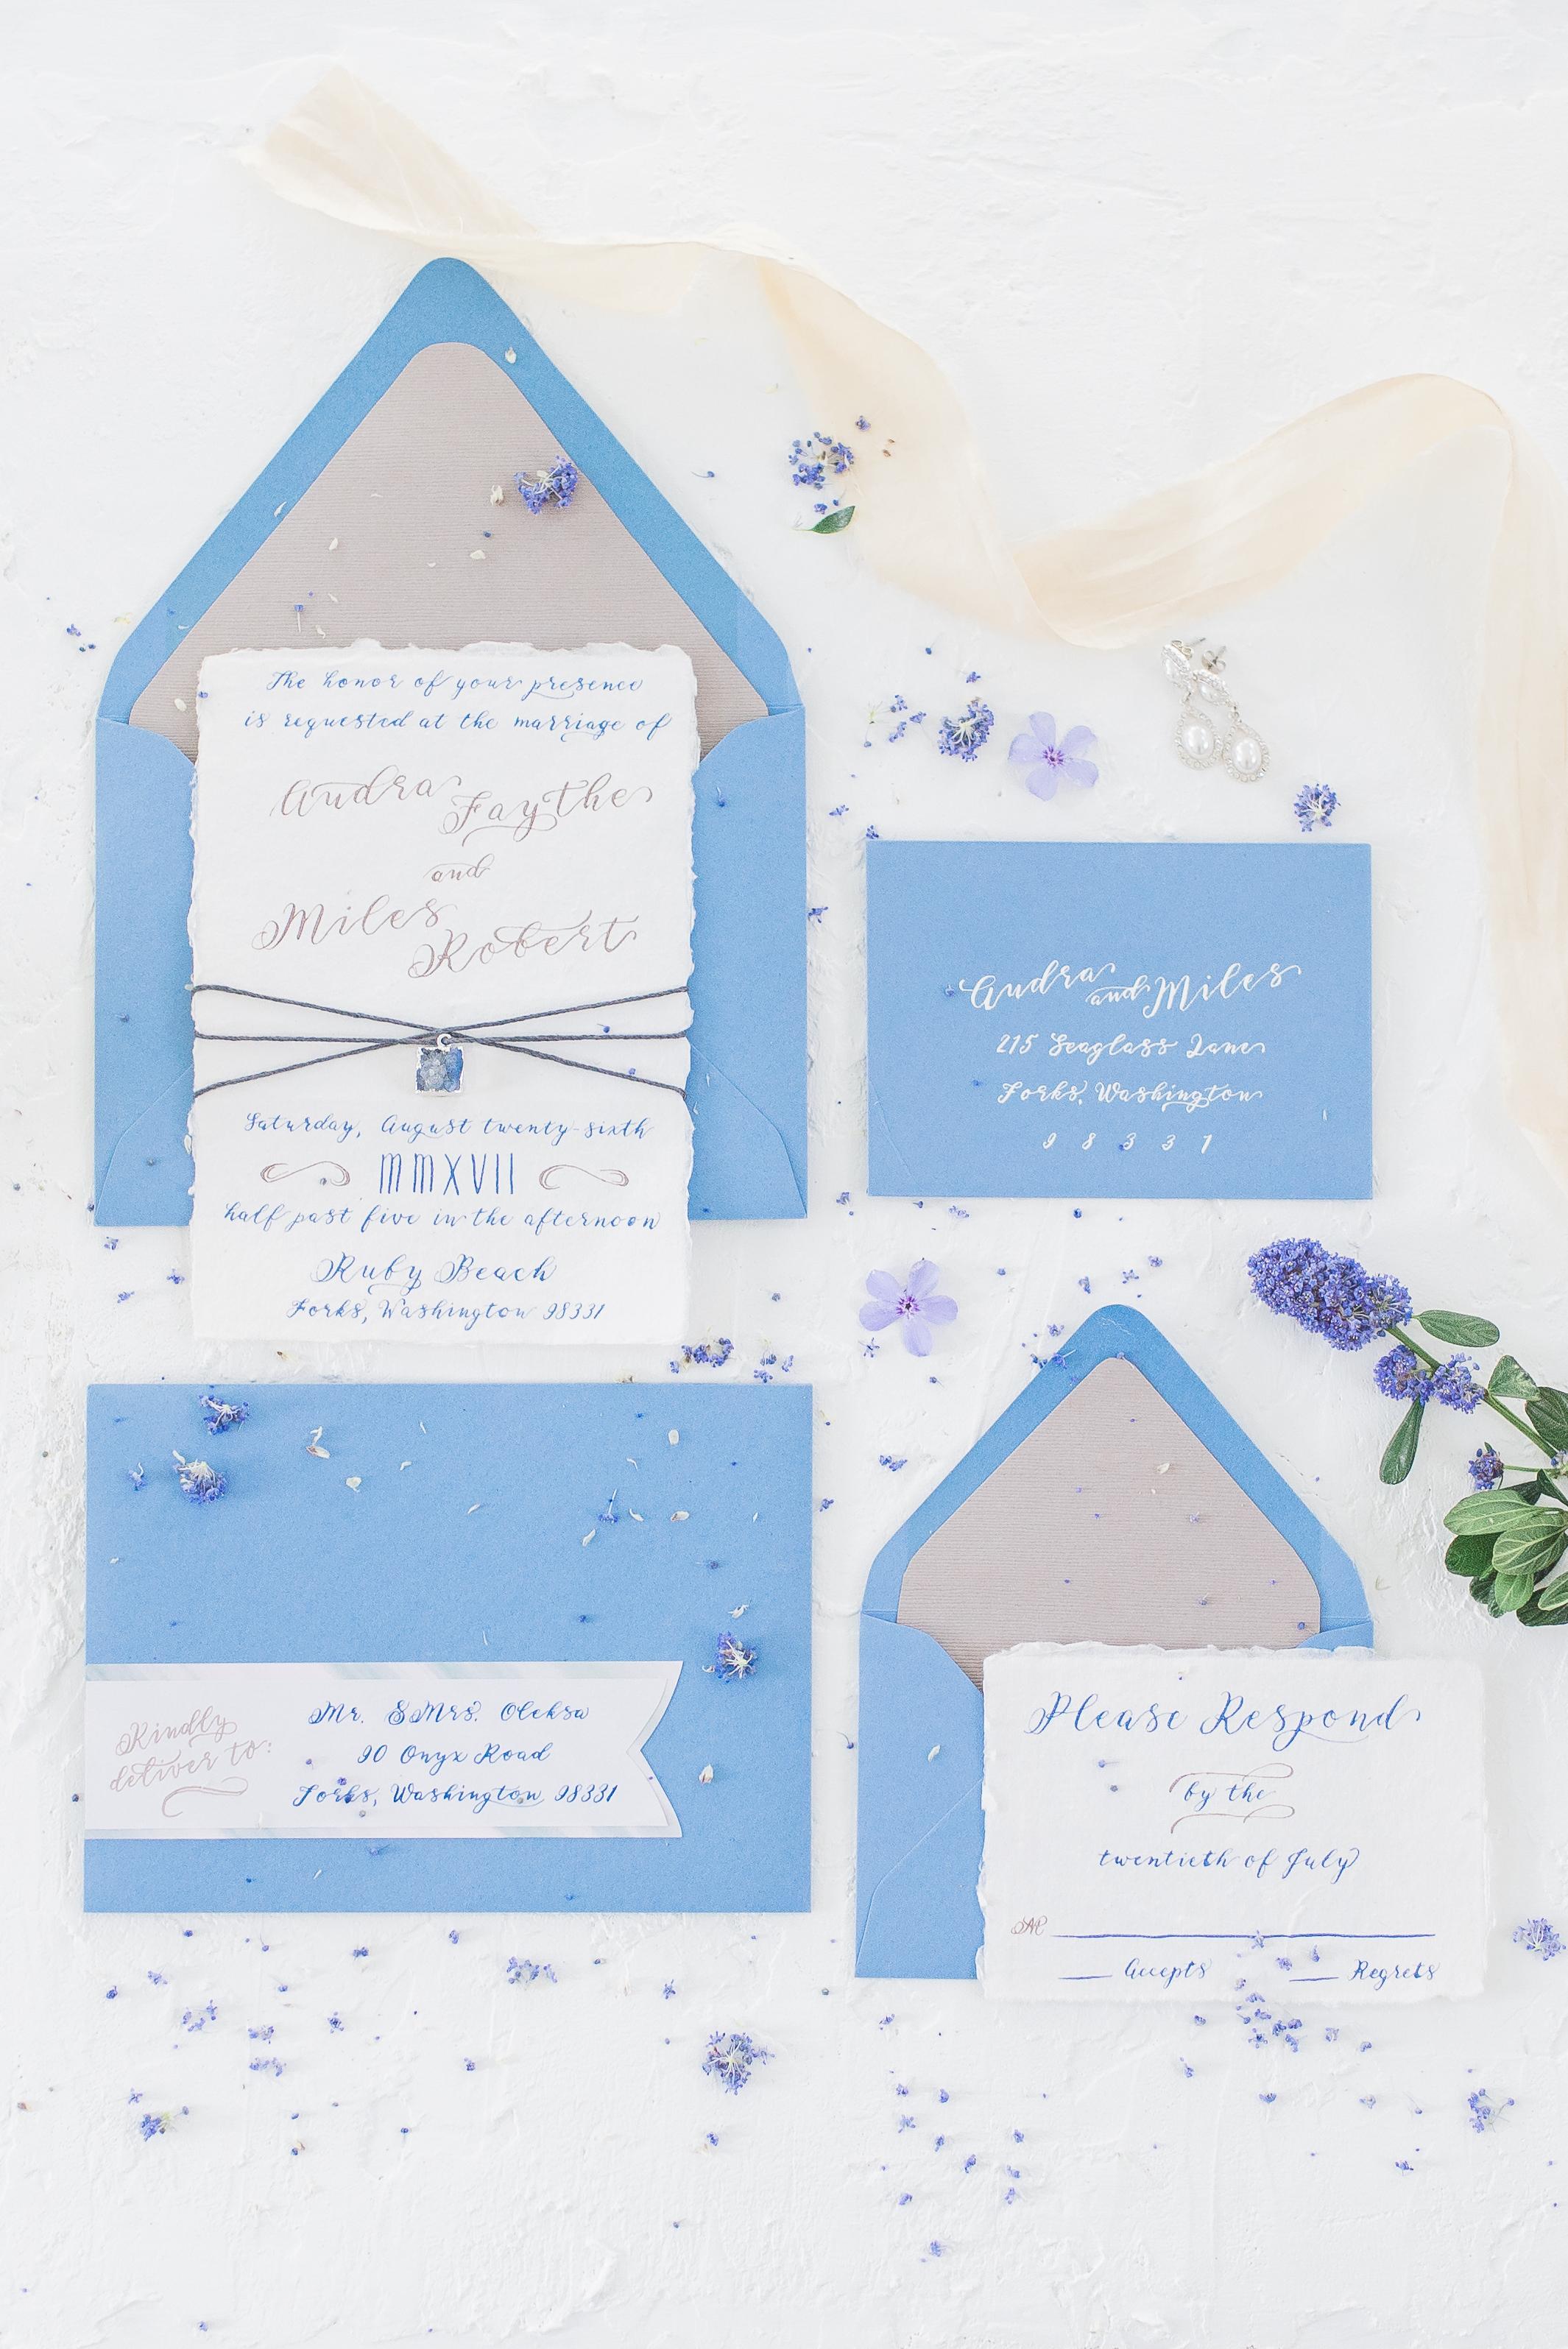 Central PA, York PA, JesSmith Designs, custom, wedding, invitations, bridal, announcements, save the date, birth, baby, motherhood, hanover, calligraphy, handlettering_1897.jpg